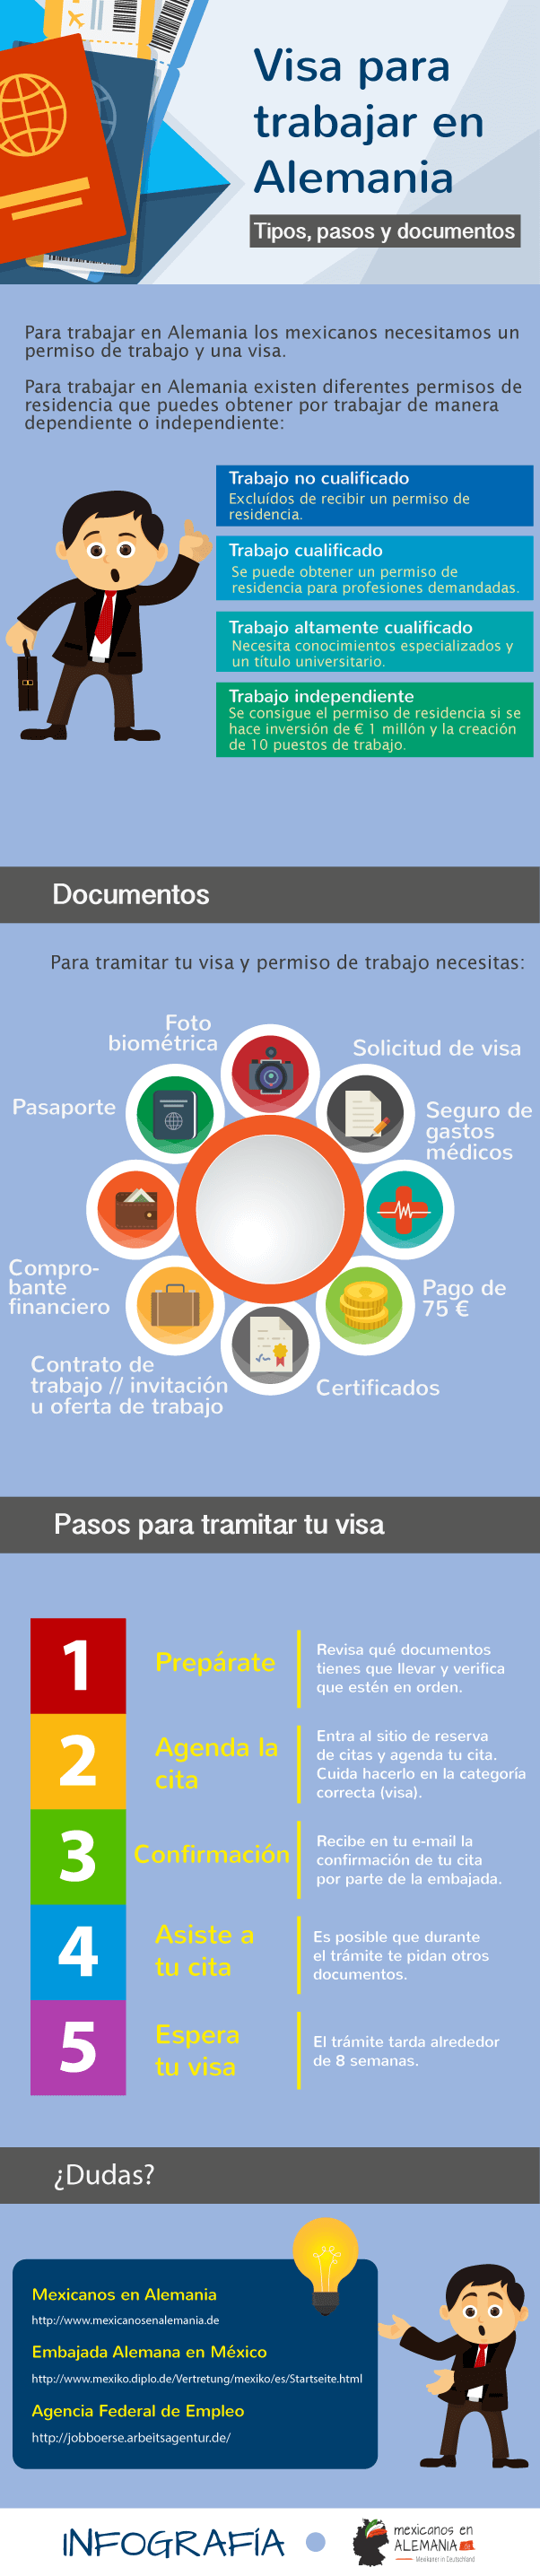 VisaTrabajoAlemania-infografia